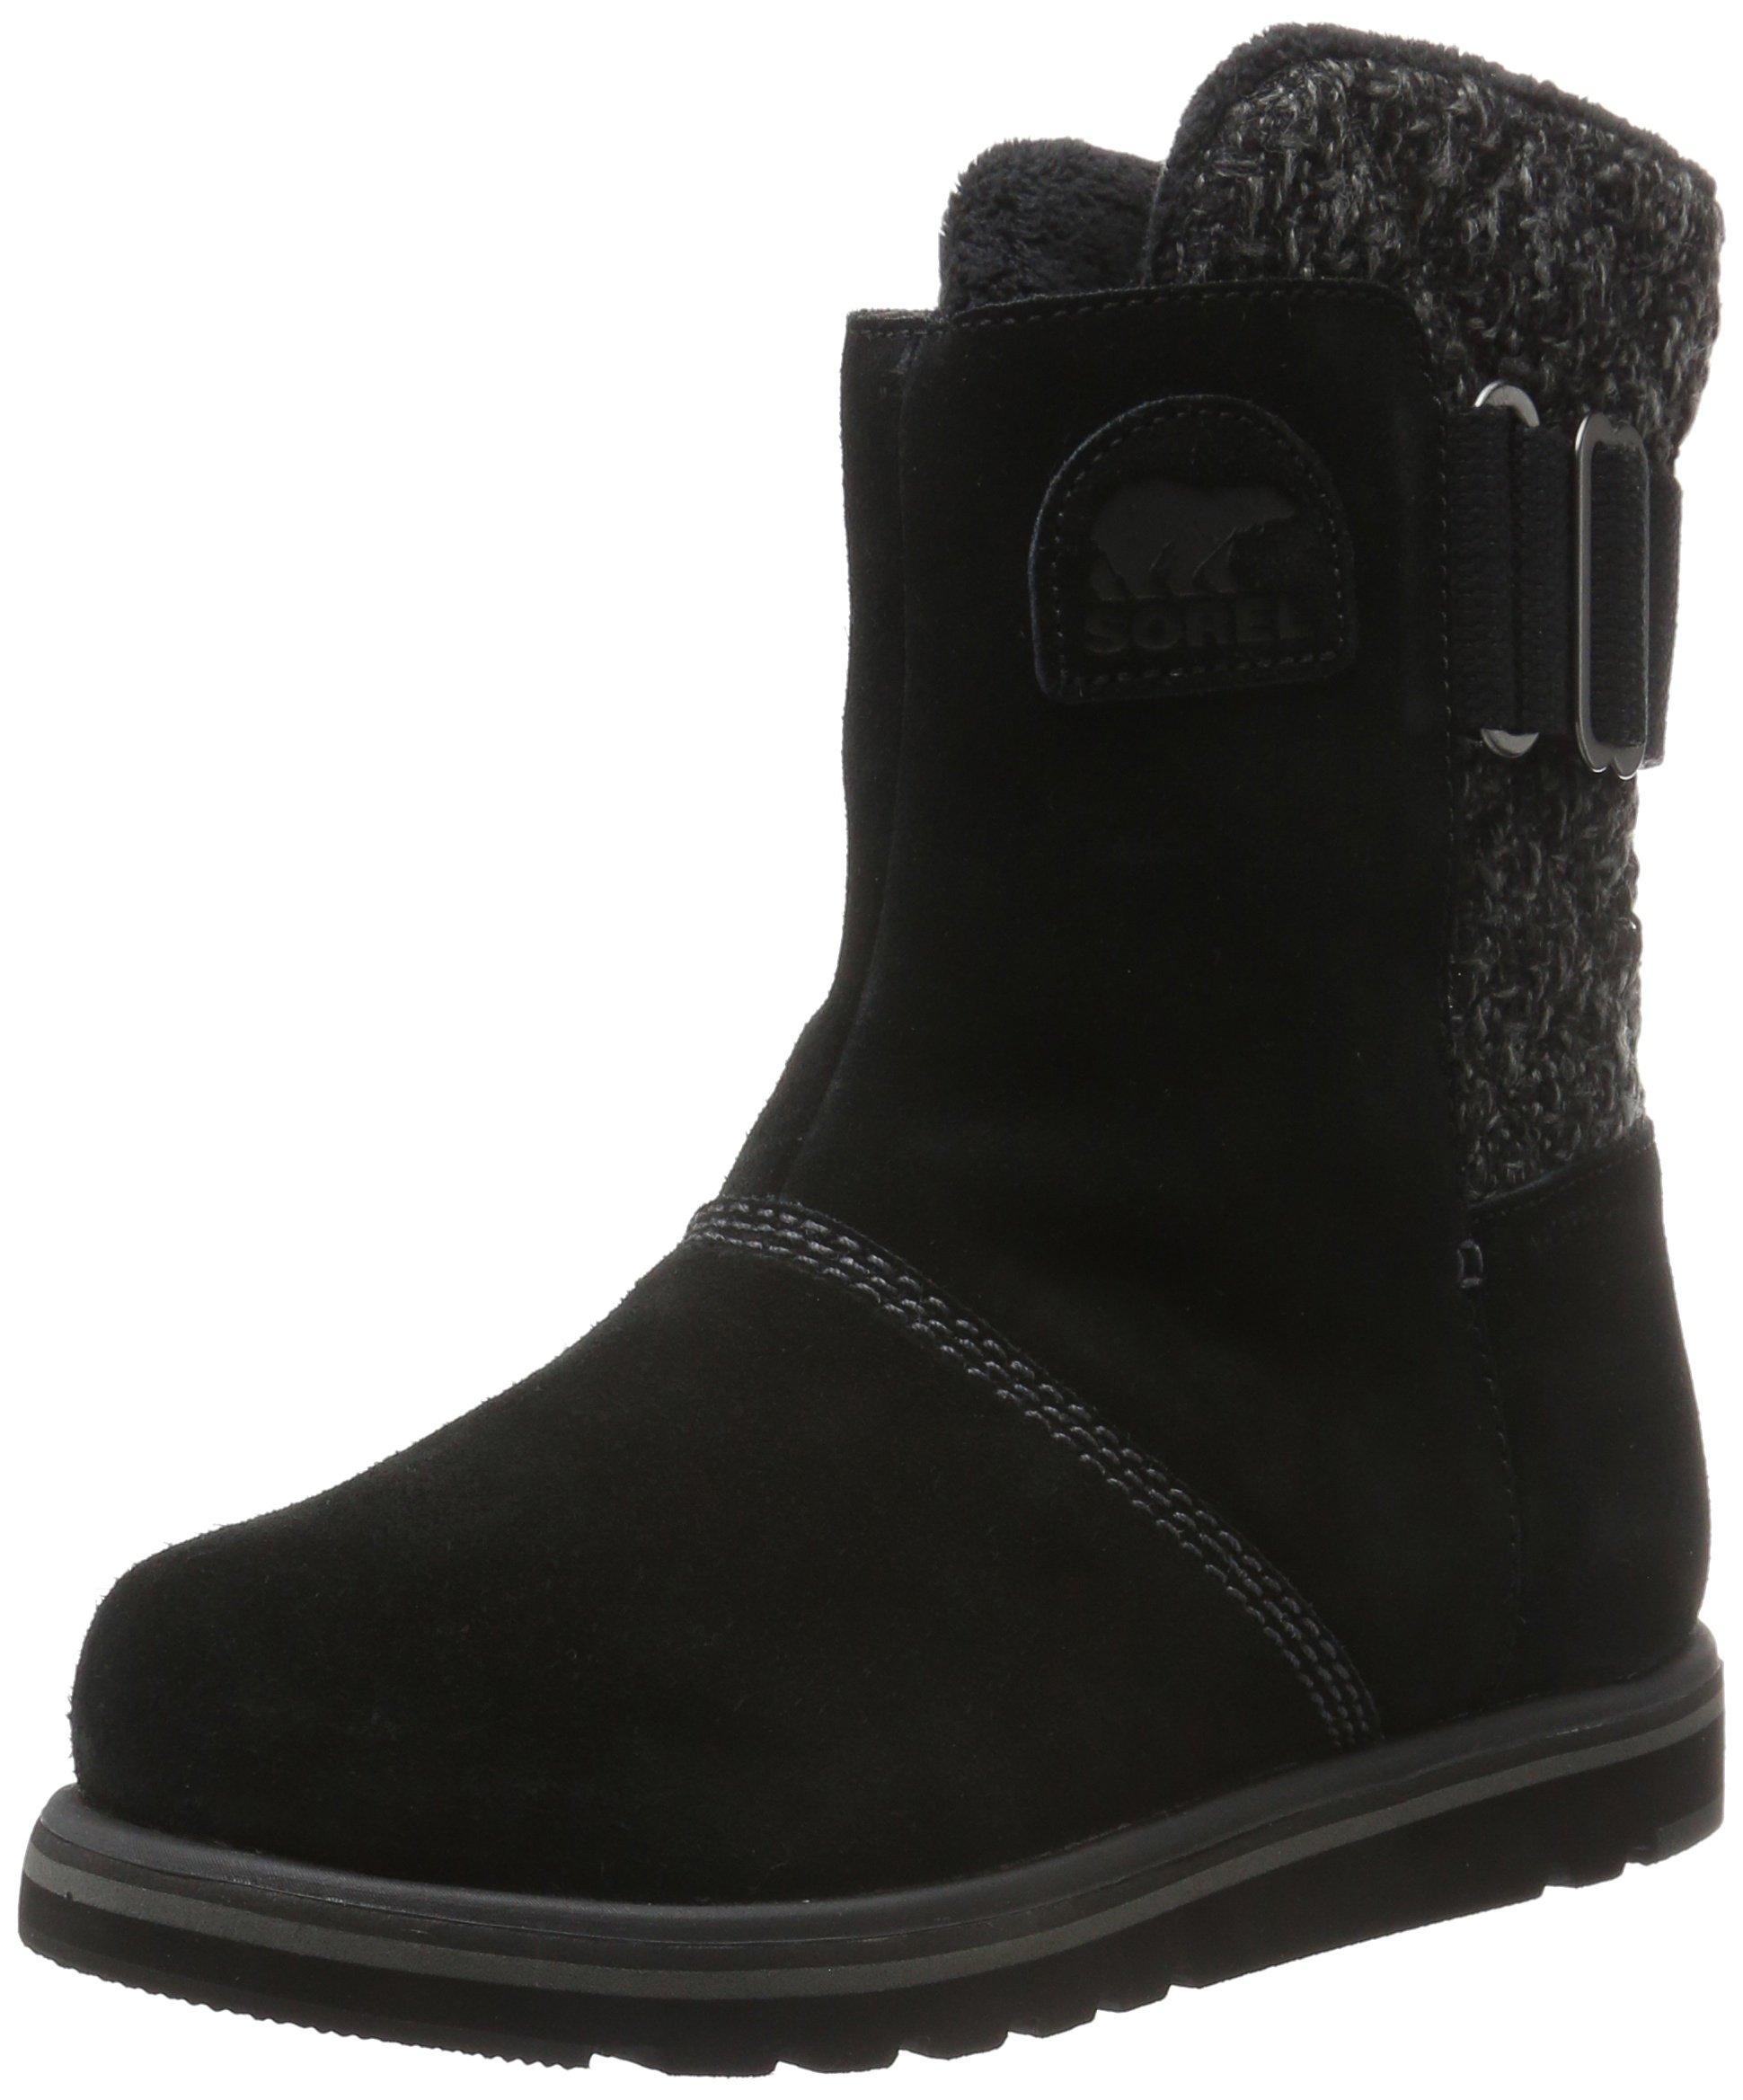 Sorel Women's Rylee Snow Boot, Black, 7.5 B US